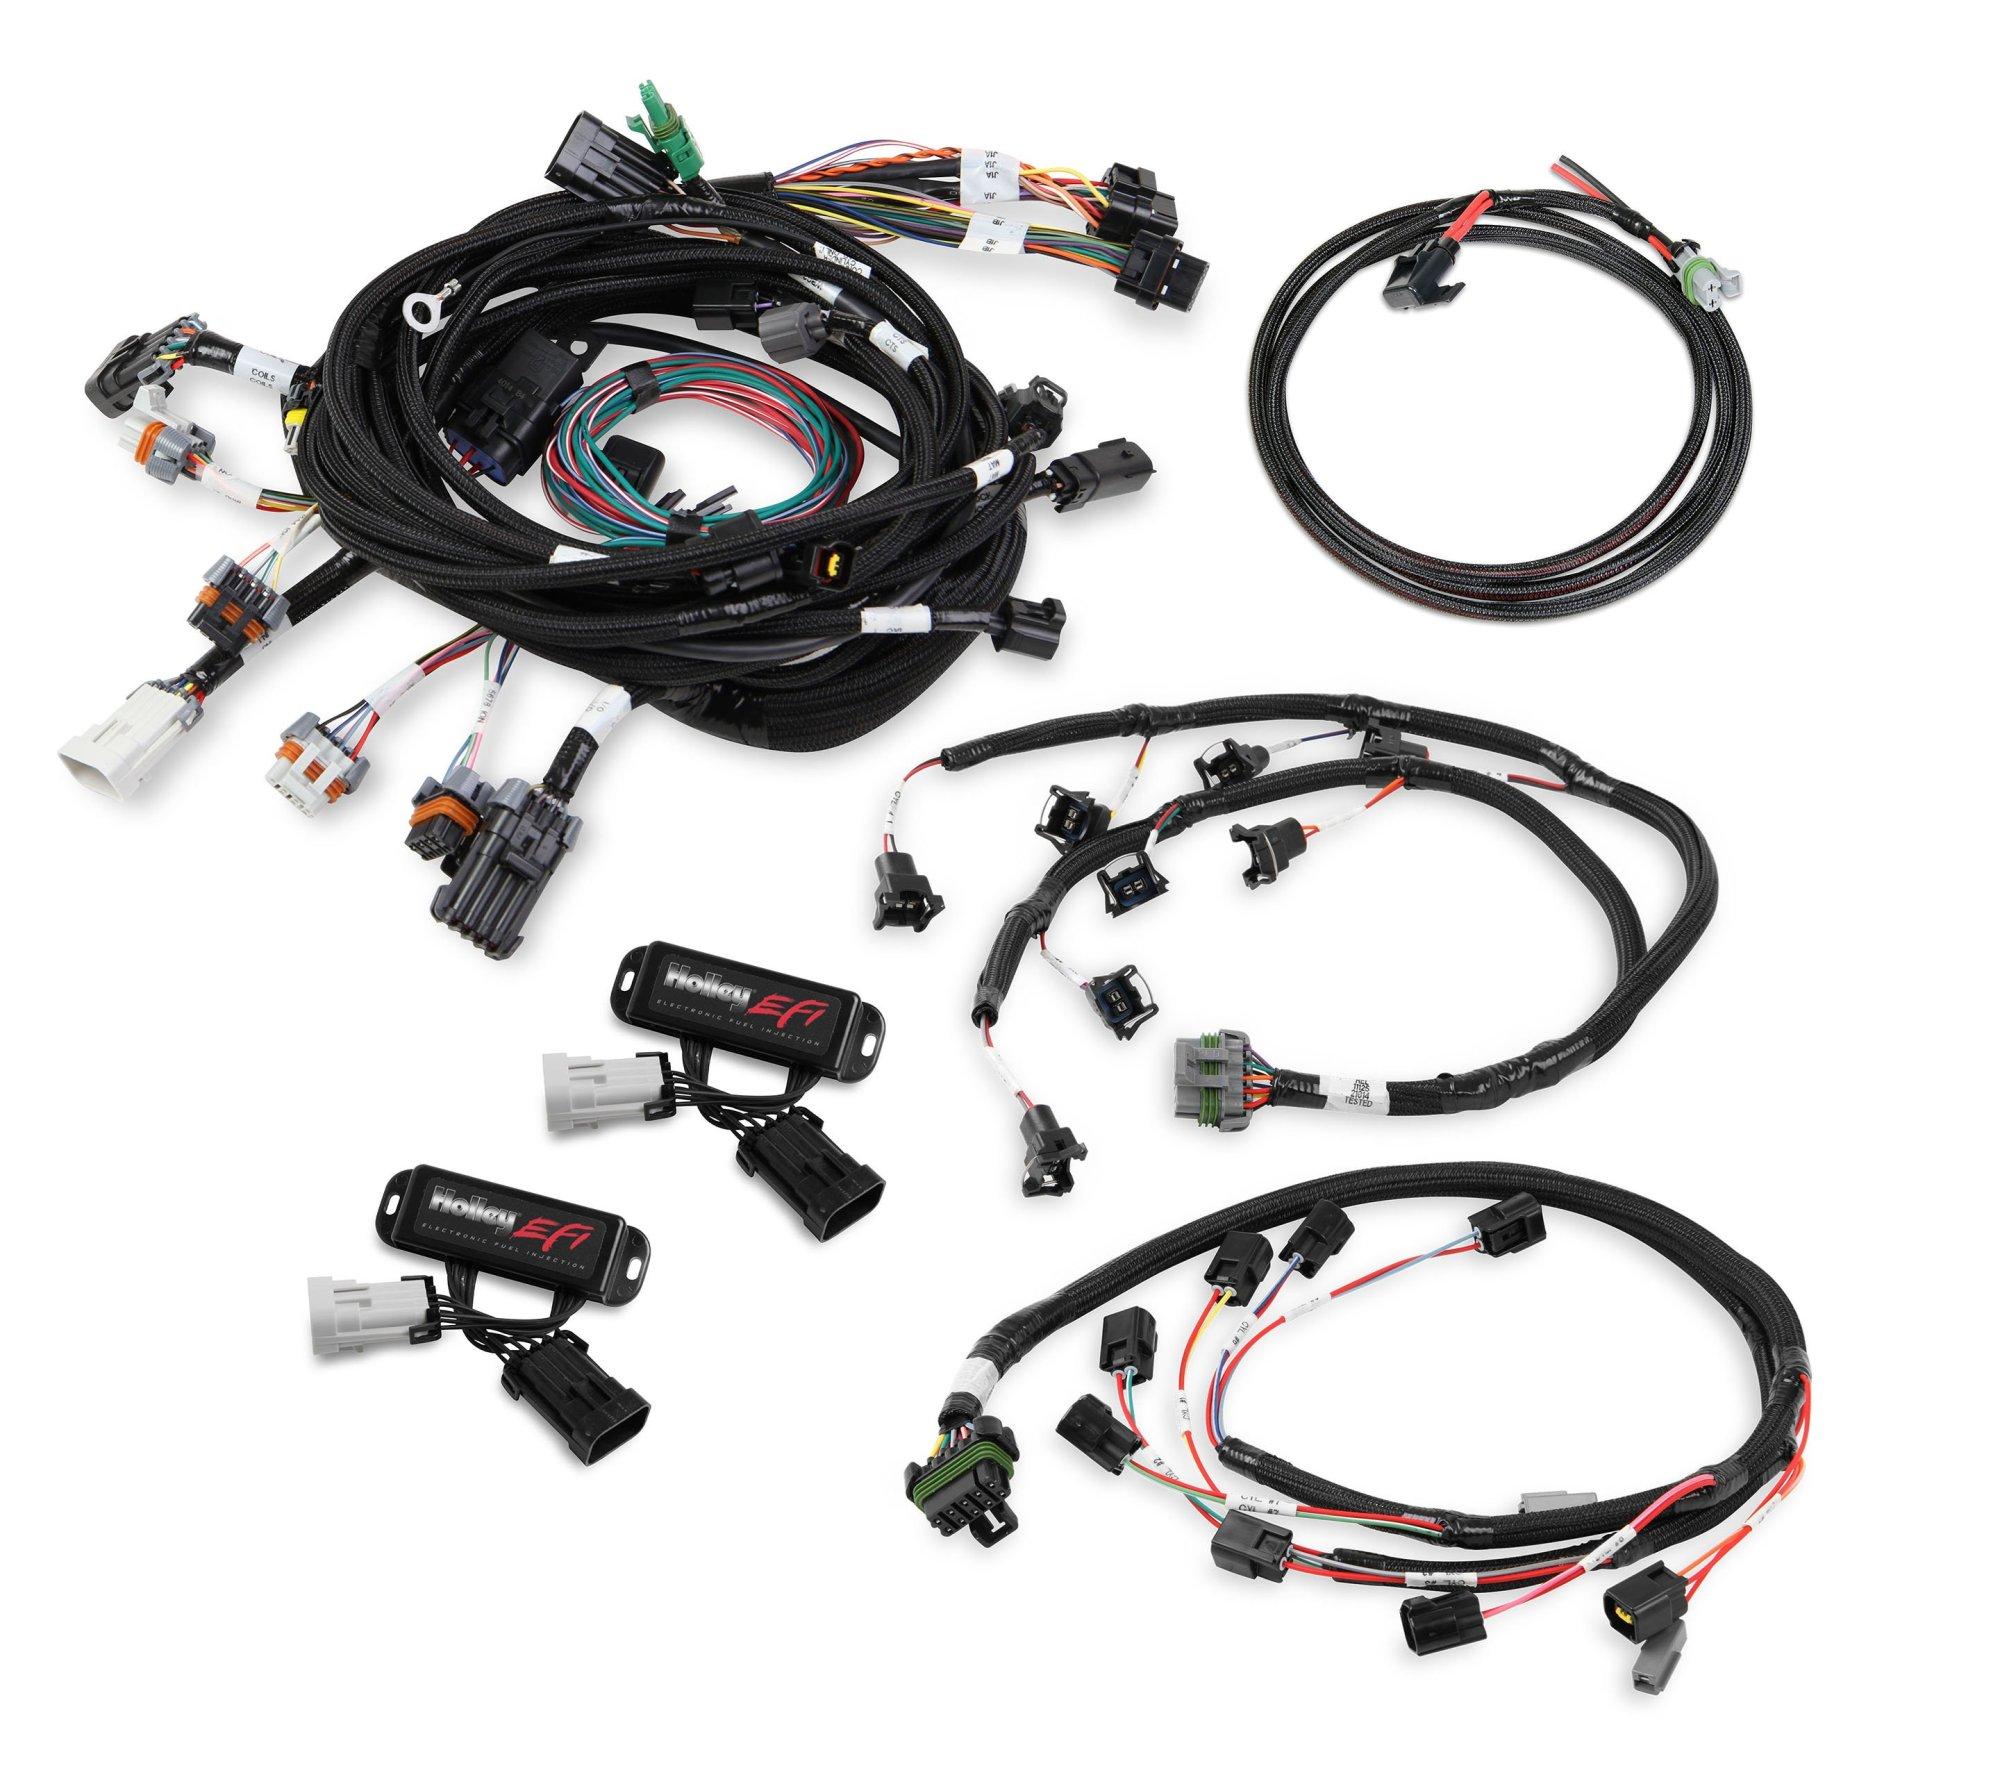 hight resolution of 558 506 ford modular 4 valve efi harness kit image